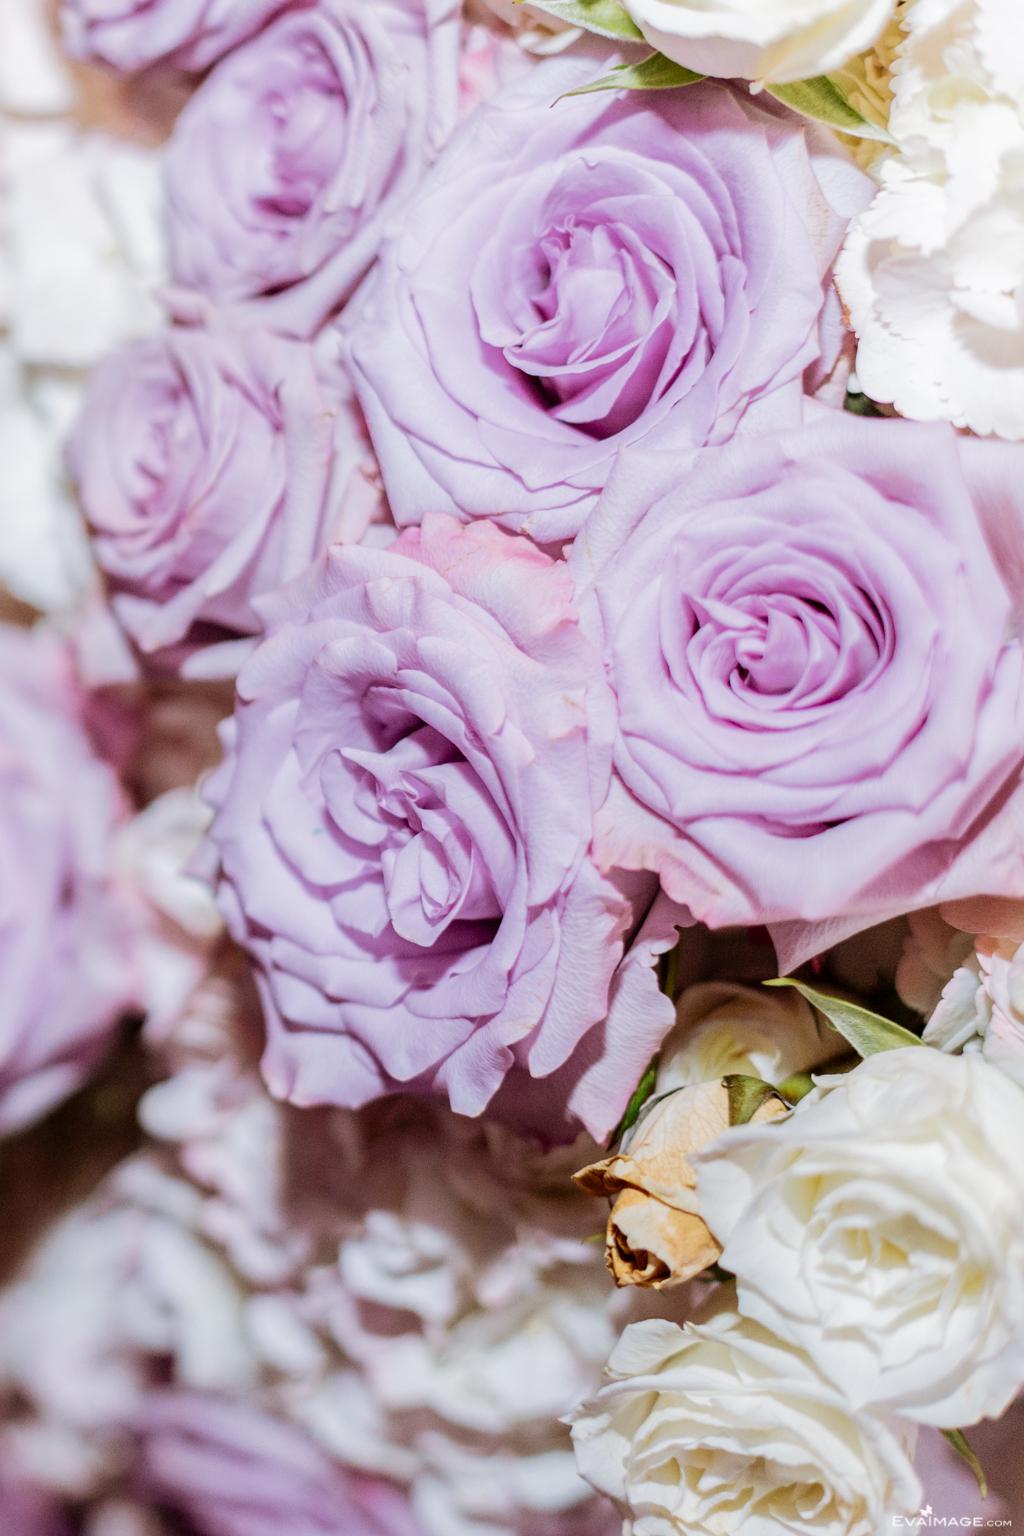 Purple Roses Toronto Florist by EvaImage Photography.jpg